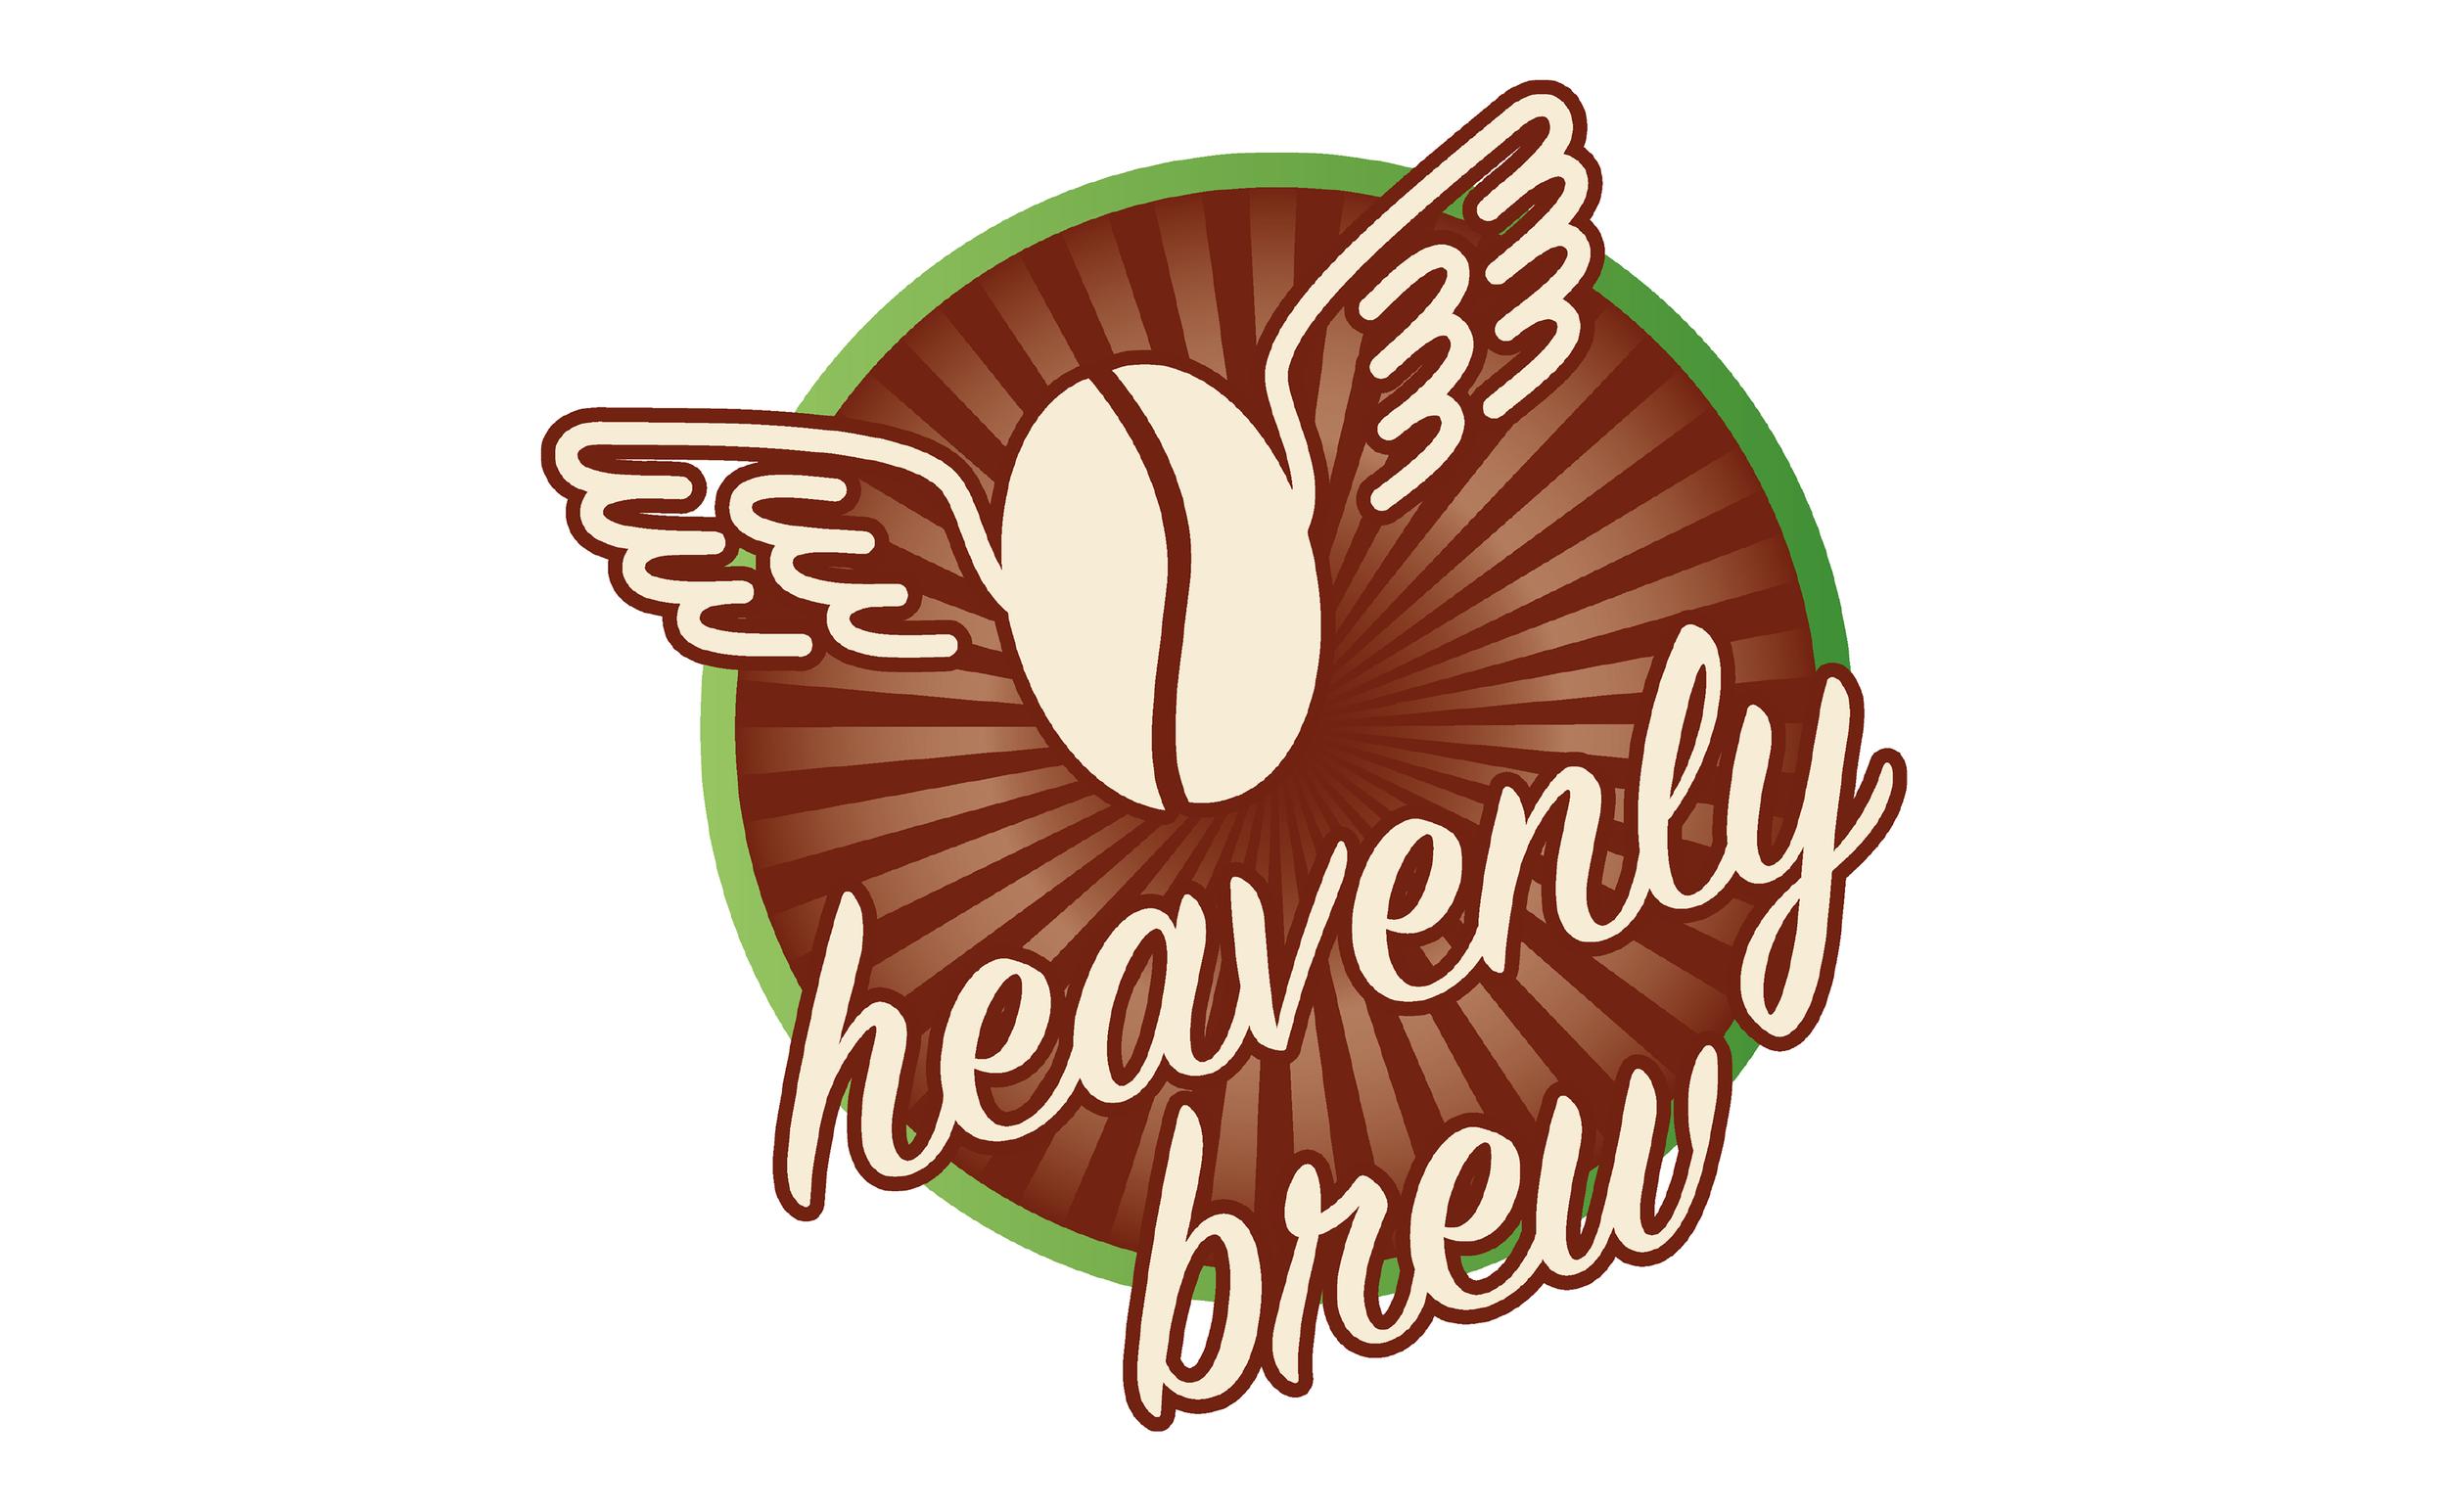 Heavenly Brew